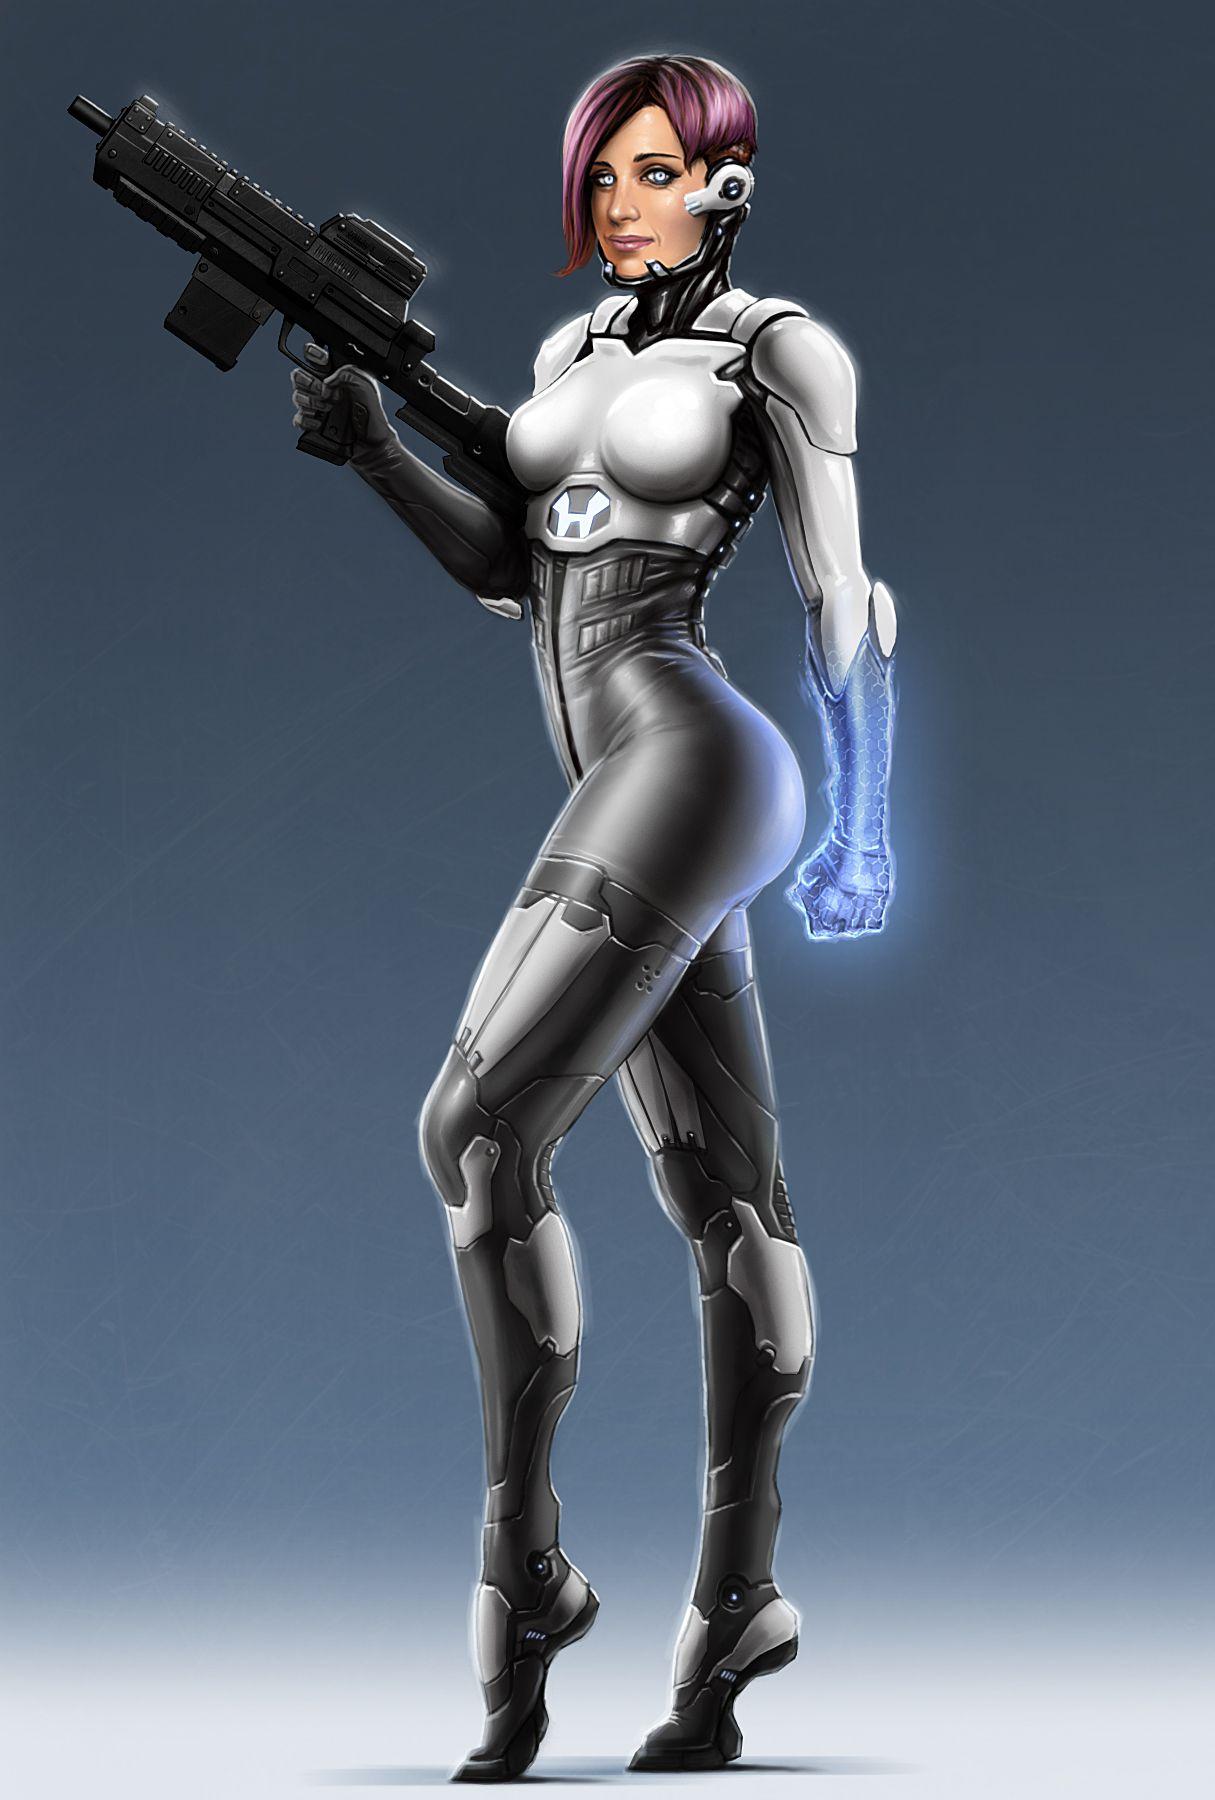 cyberpunk, future girl, futuristic look, purple hair, implants